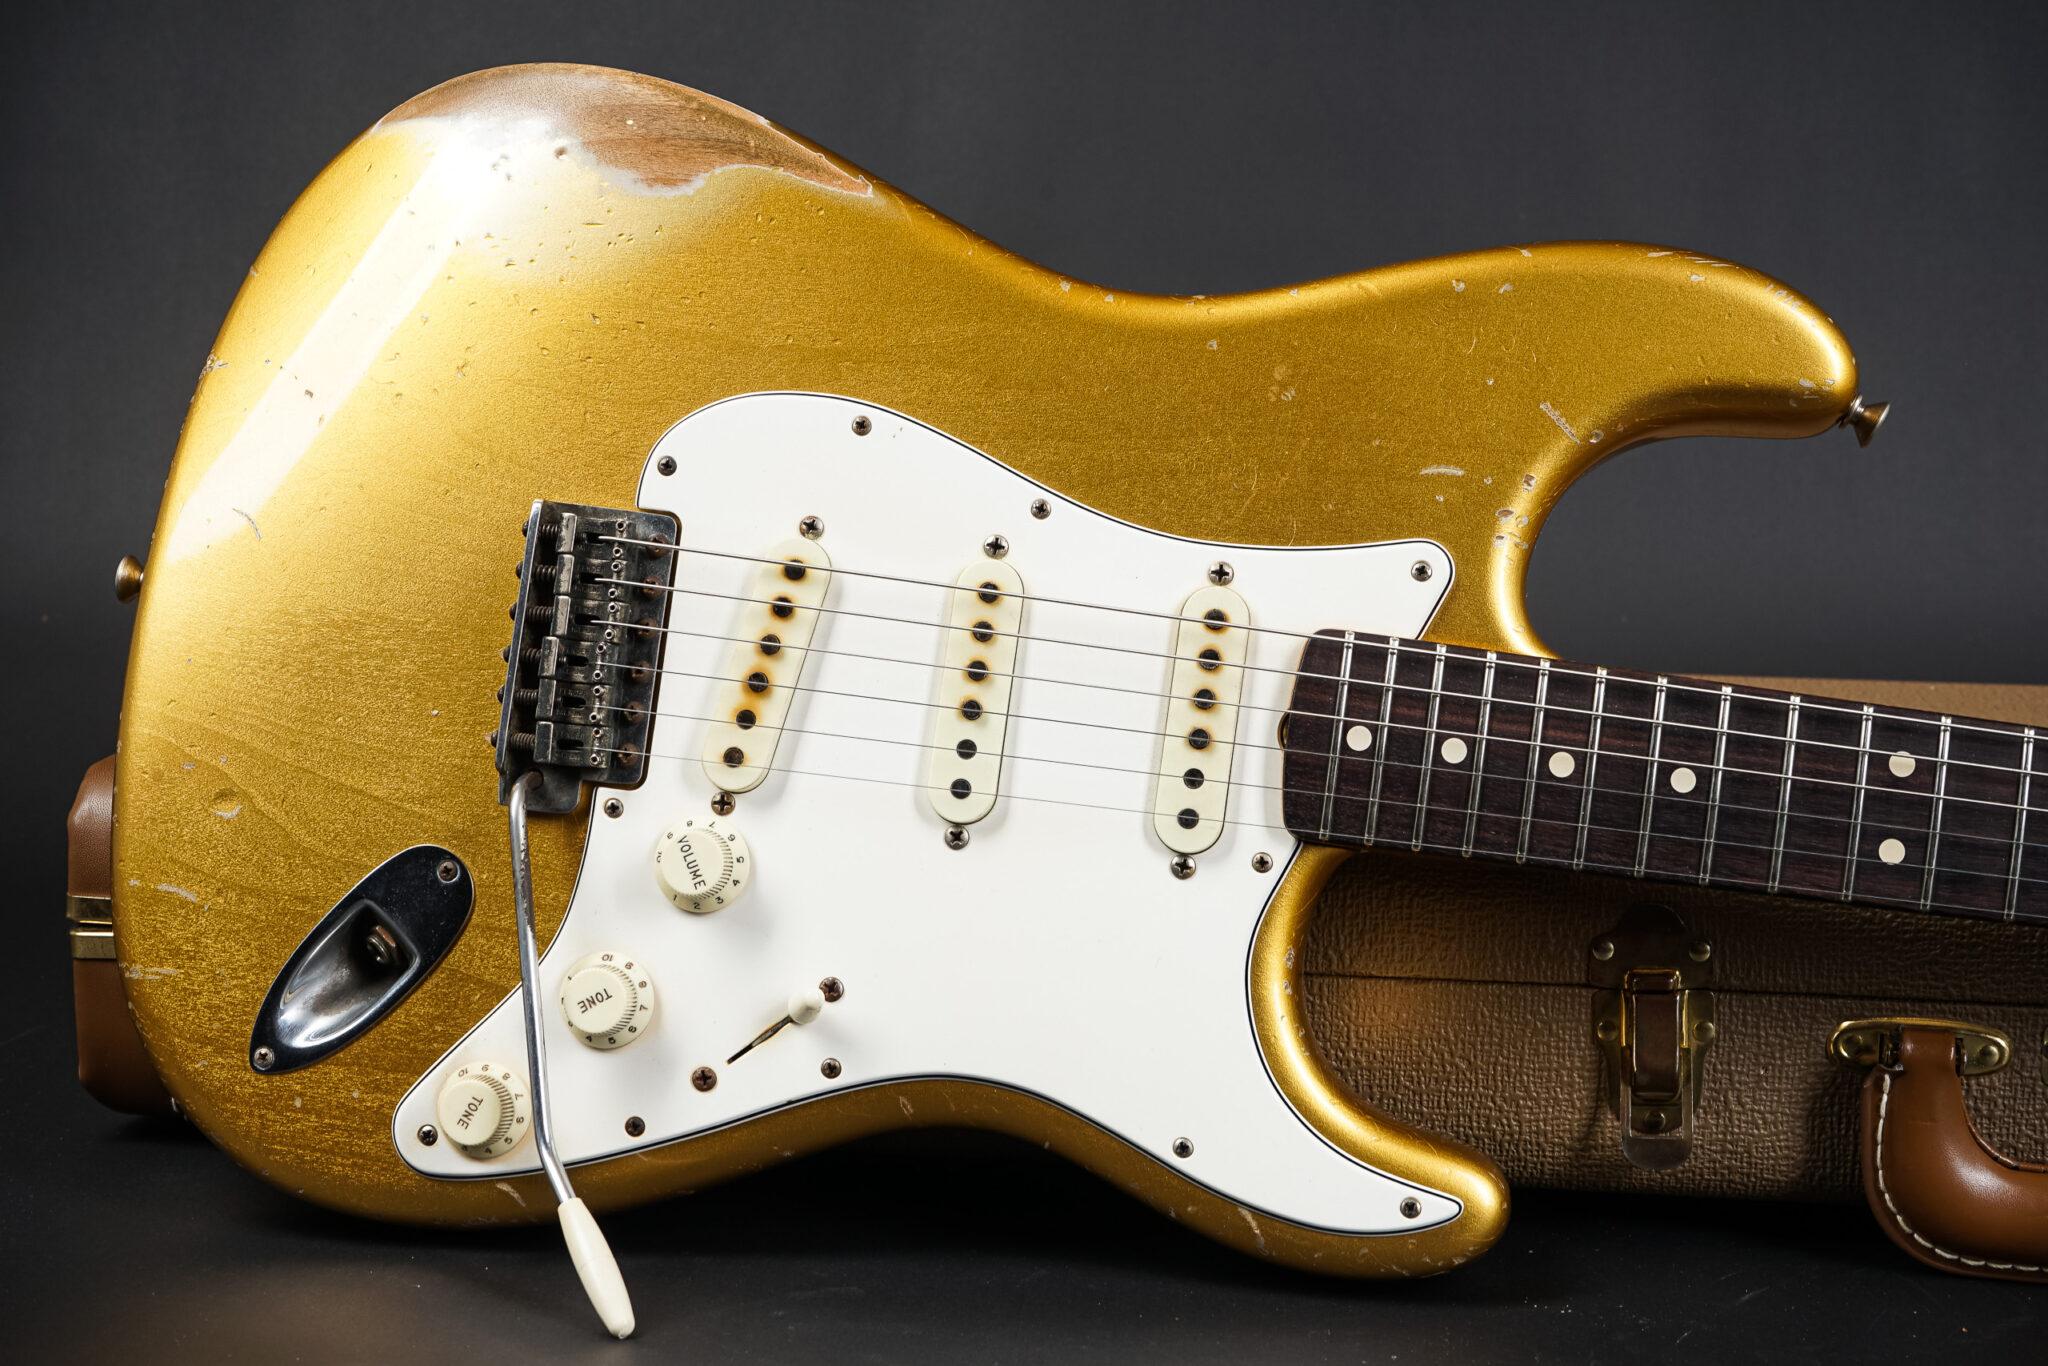 https://guitarpoint.de/app/uploads/products/2015-fender-john-cruz-masterbuilt-1963-stratocaster-heavy-relic-aztec-gold/2015-Fender-John-Cruz-Masterbuilt-1963-Stratocaster-Aztec-Gold-JC2819-8-2048x1366.jpg